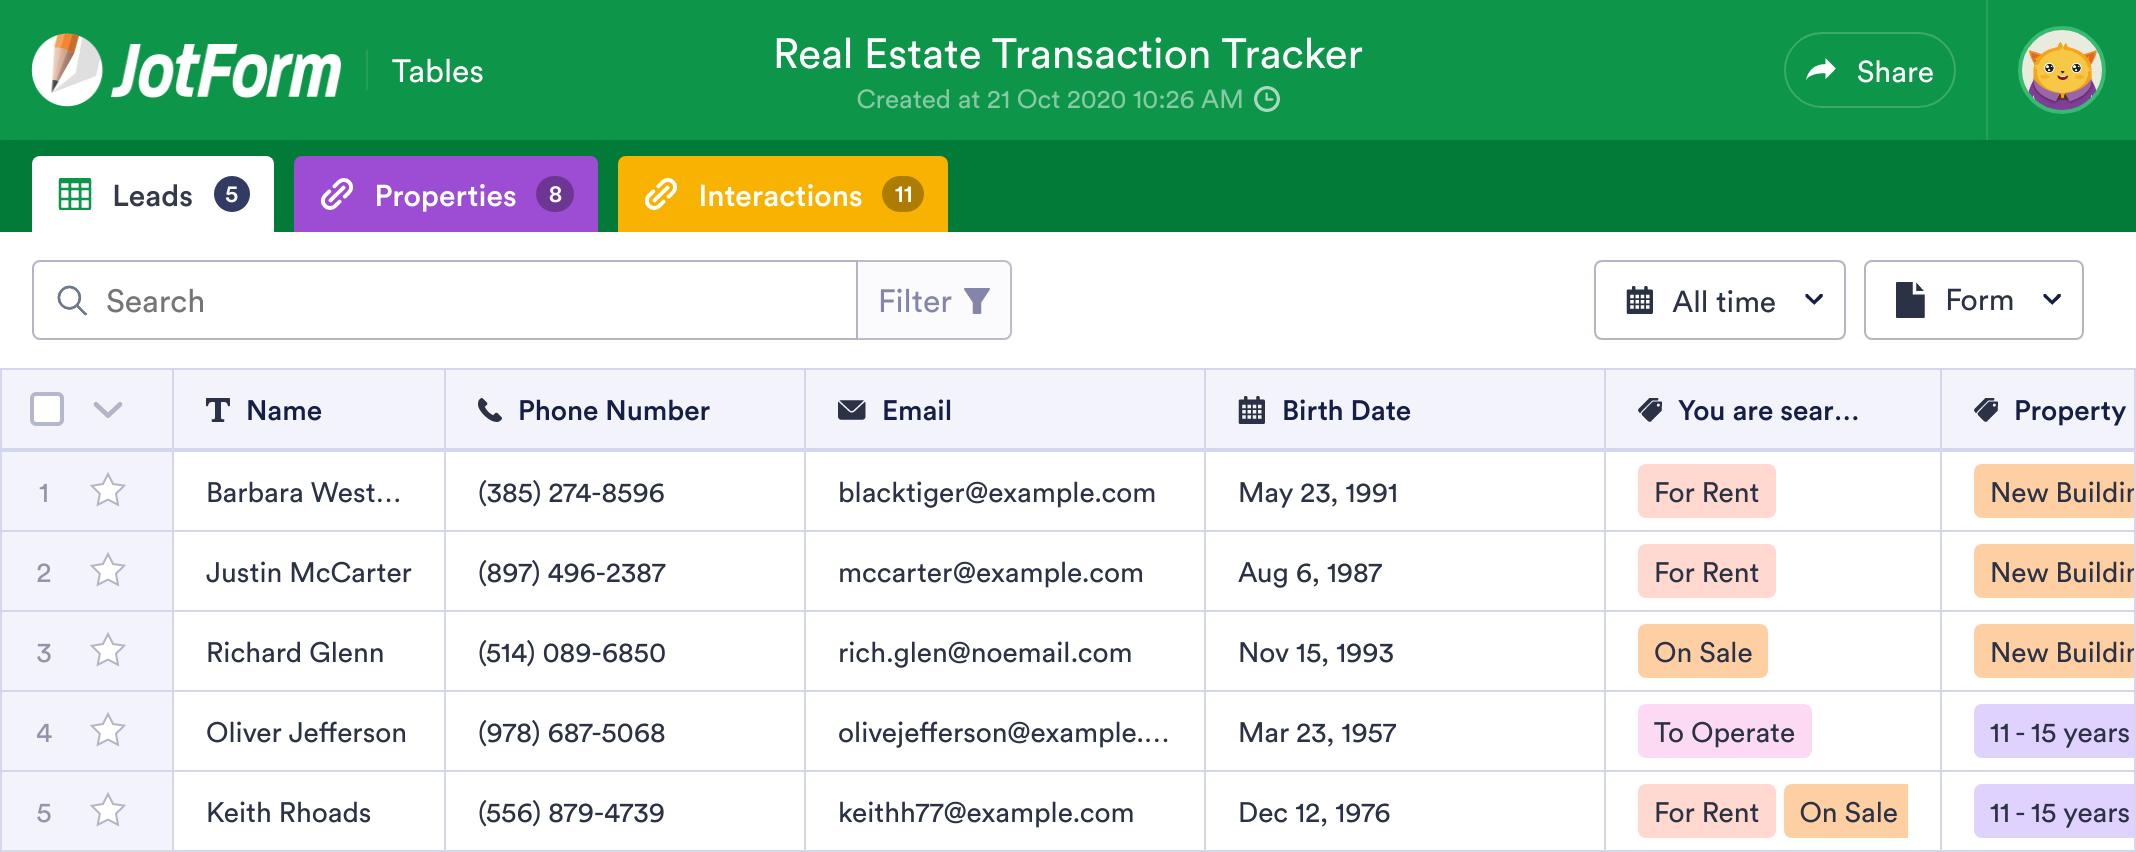 Real Estate Transaction Tracker